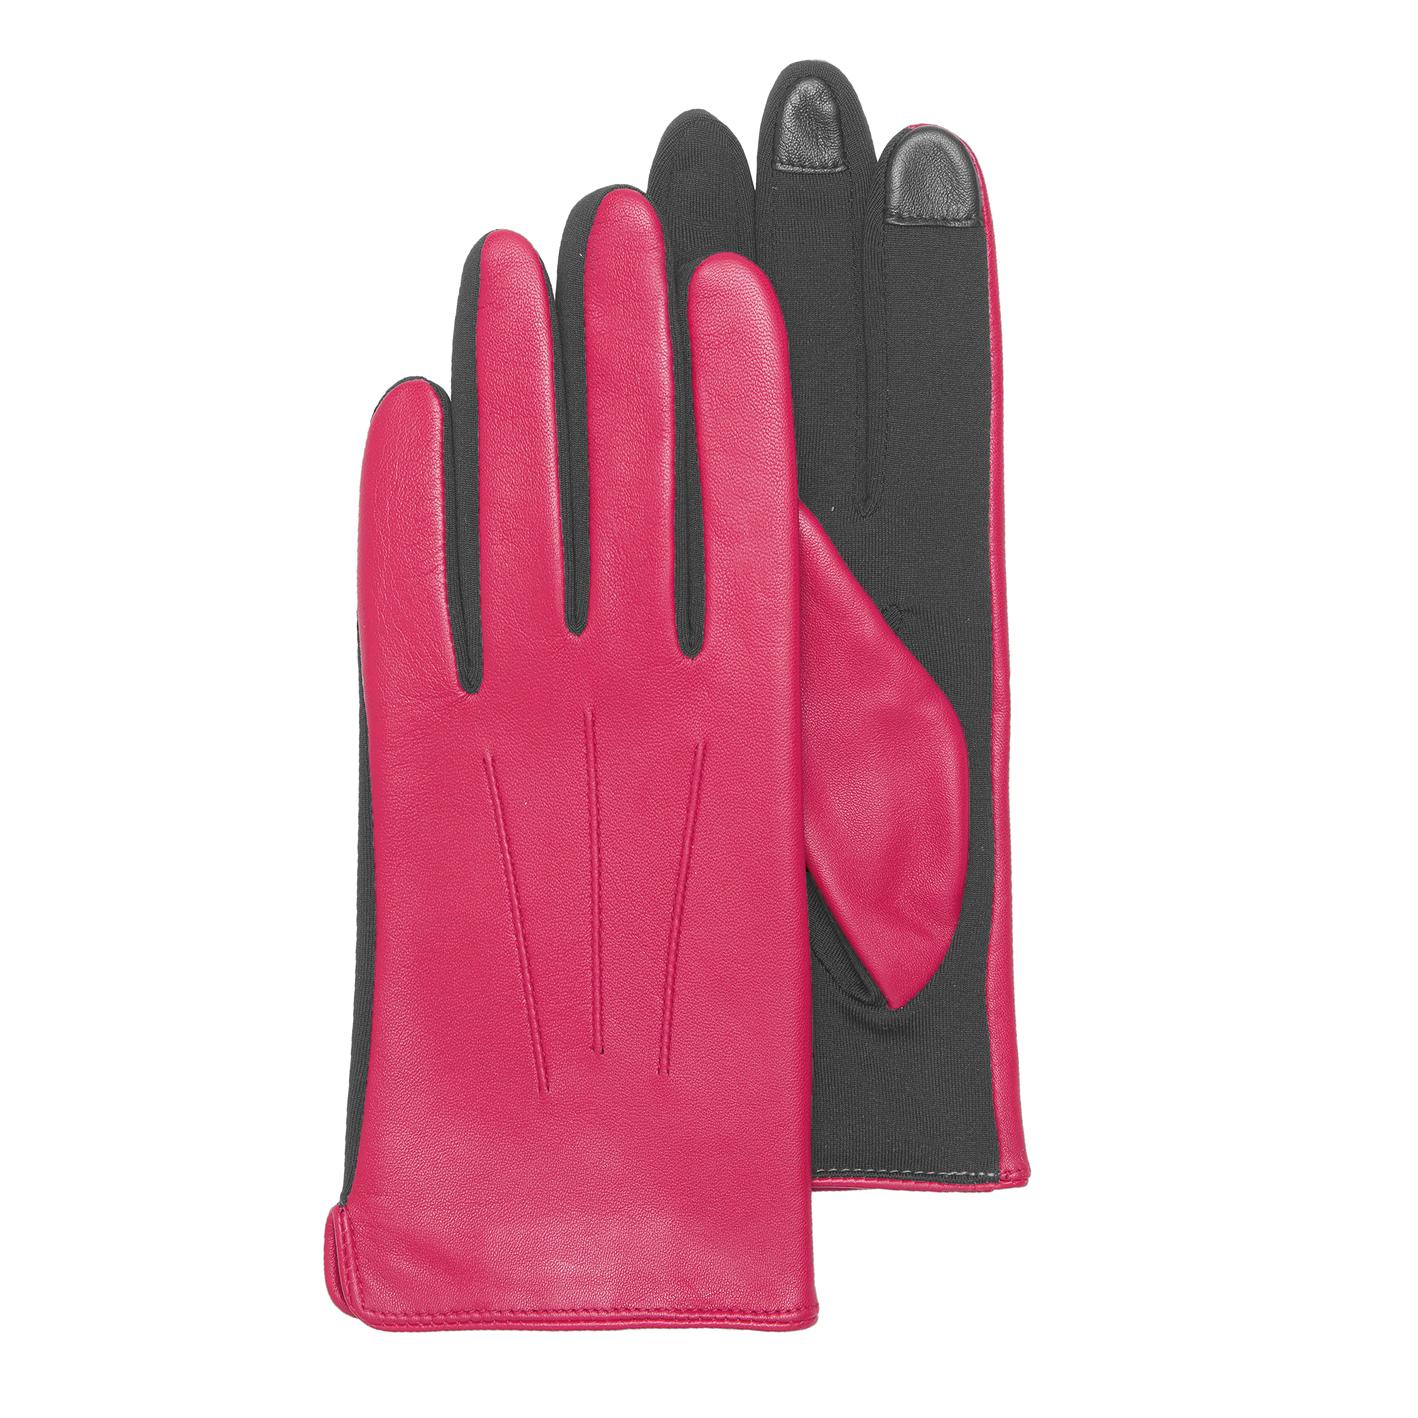 Mia 268 hot pink